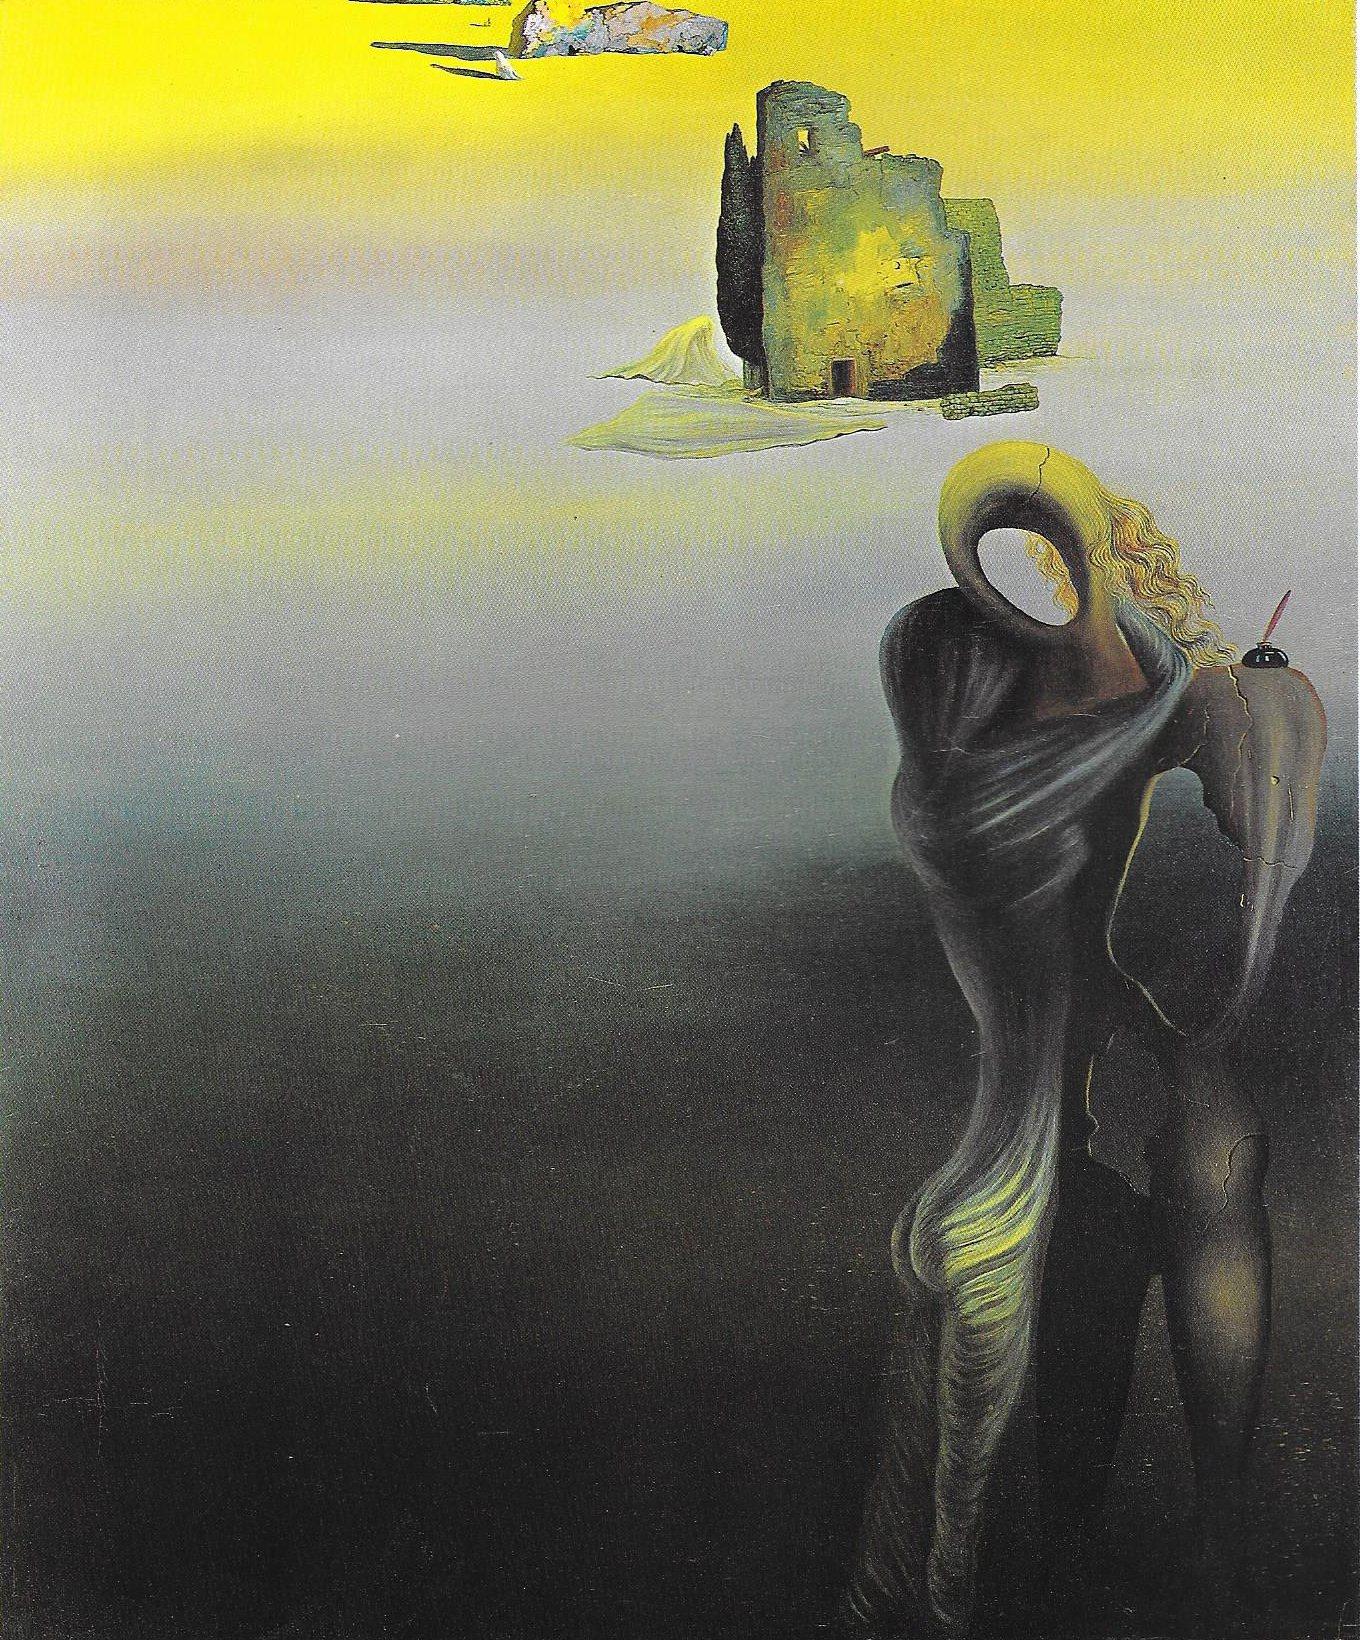 Salvador Dali, Gradiva retrouve les ruines antropomorphes,1932